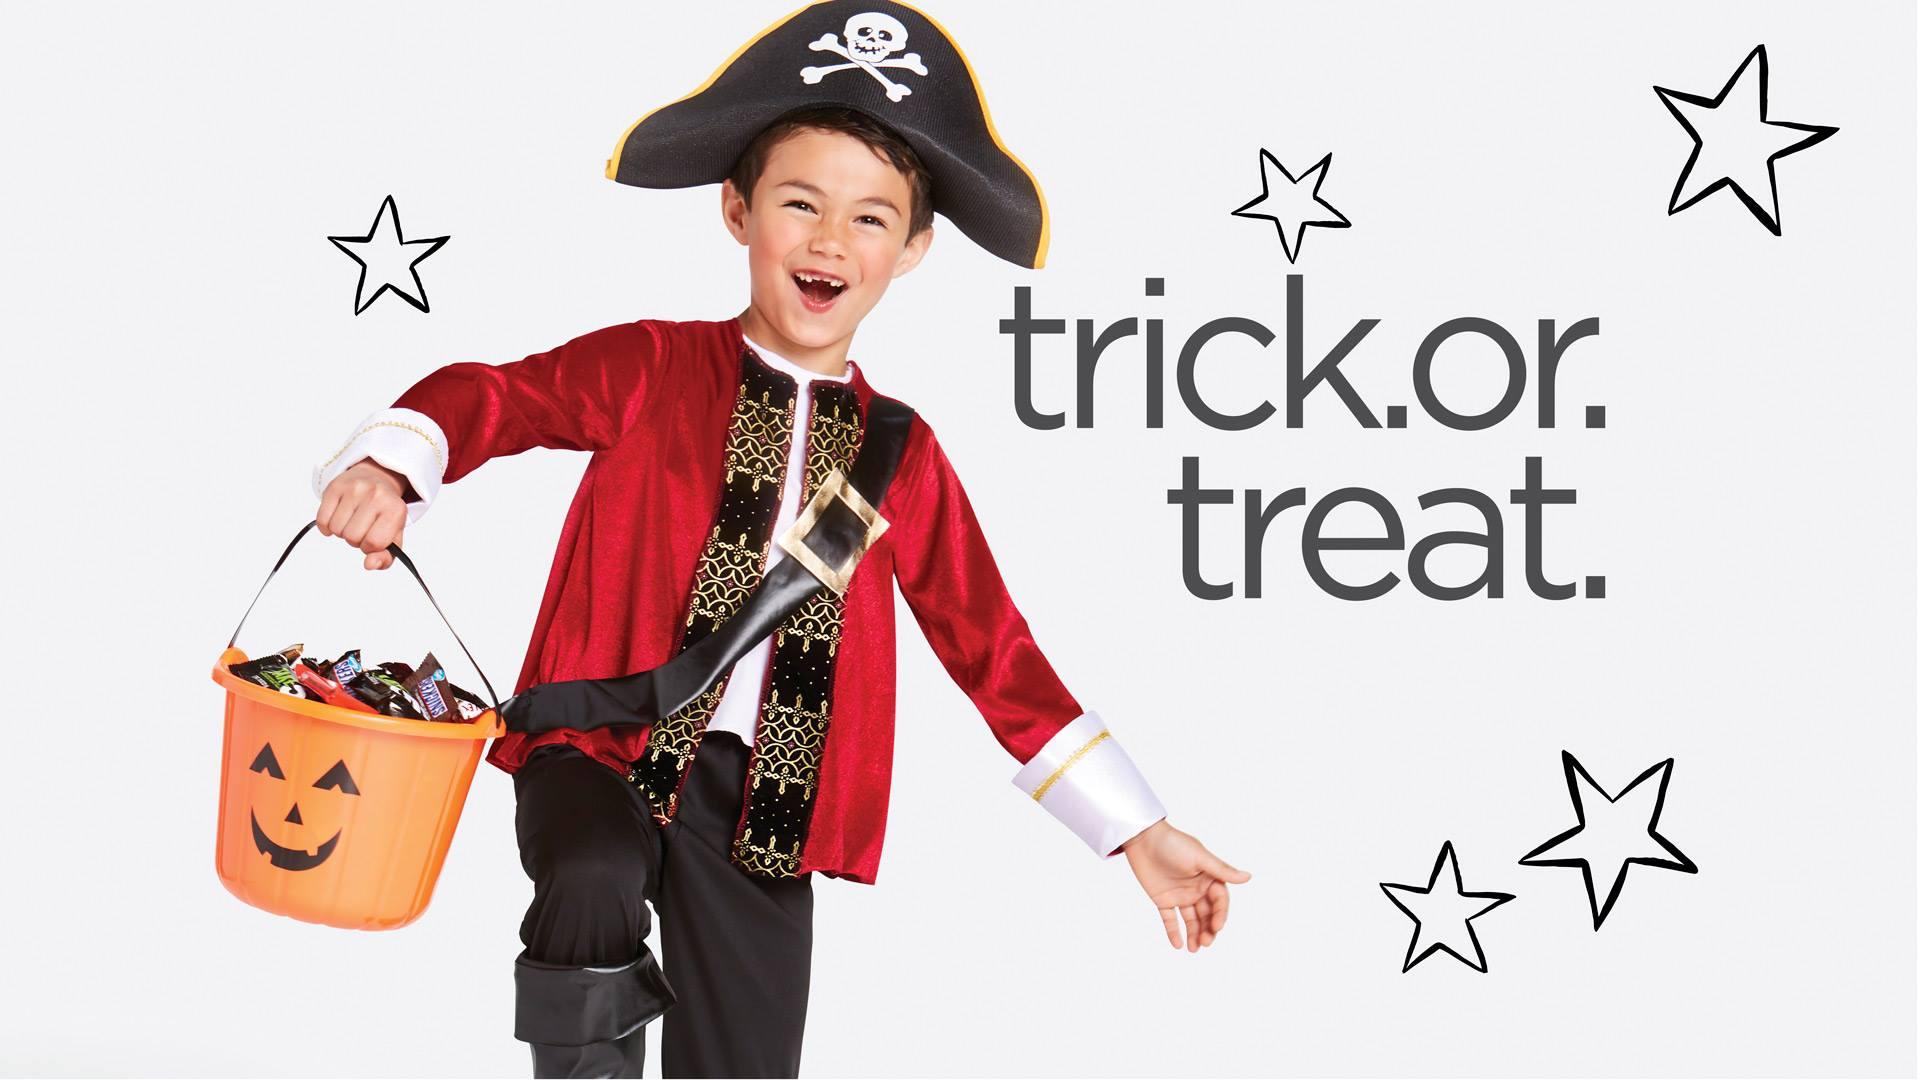 Trick or treat pirate kid